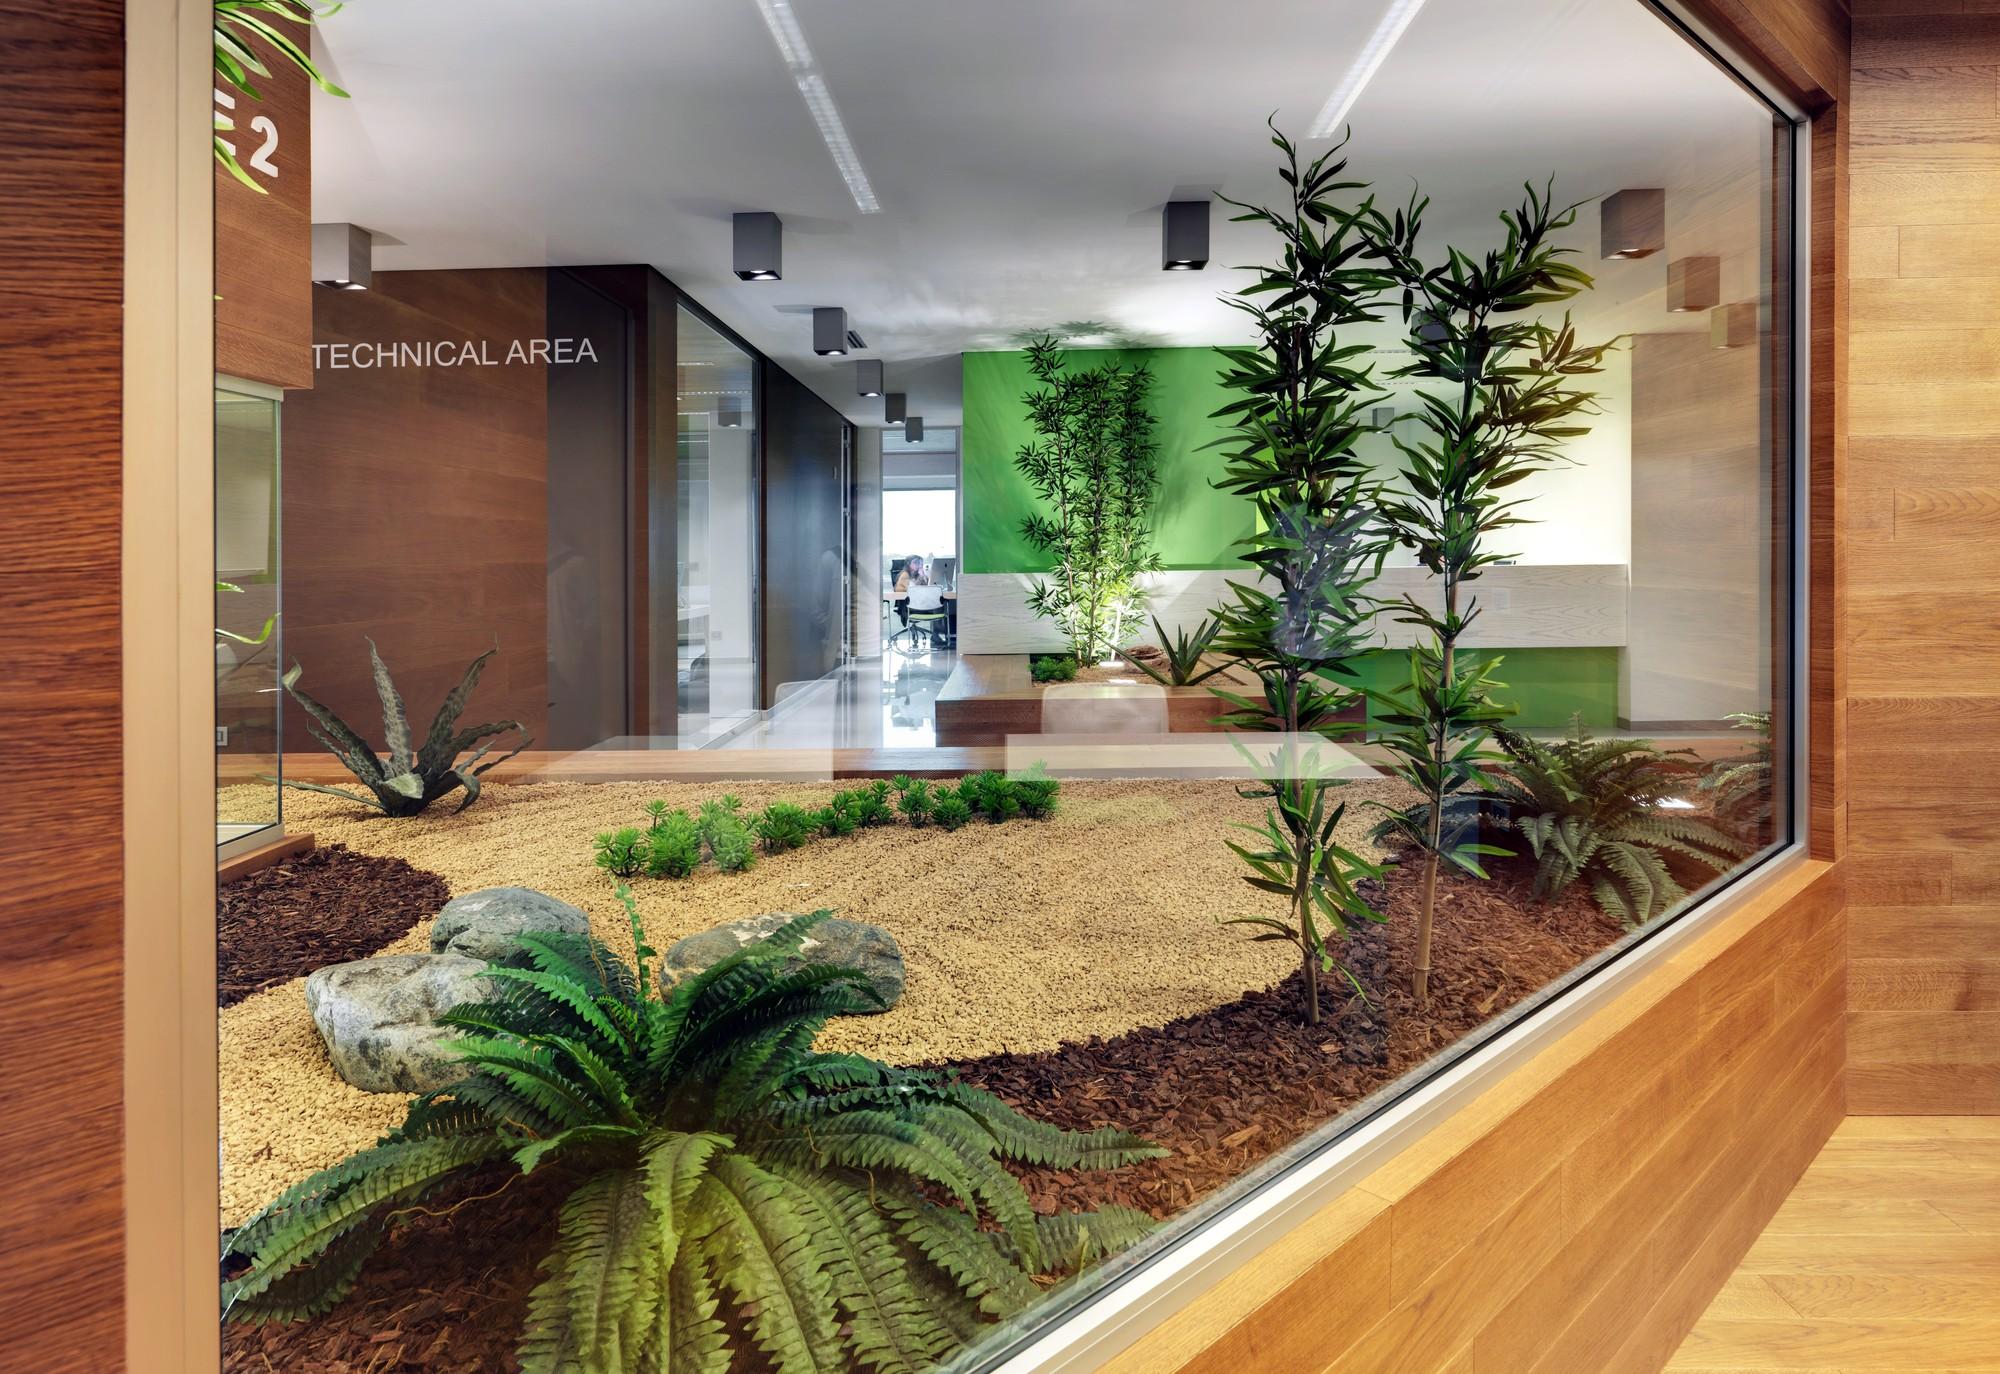 Barra&Barra Office / Damilano Studio Architects